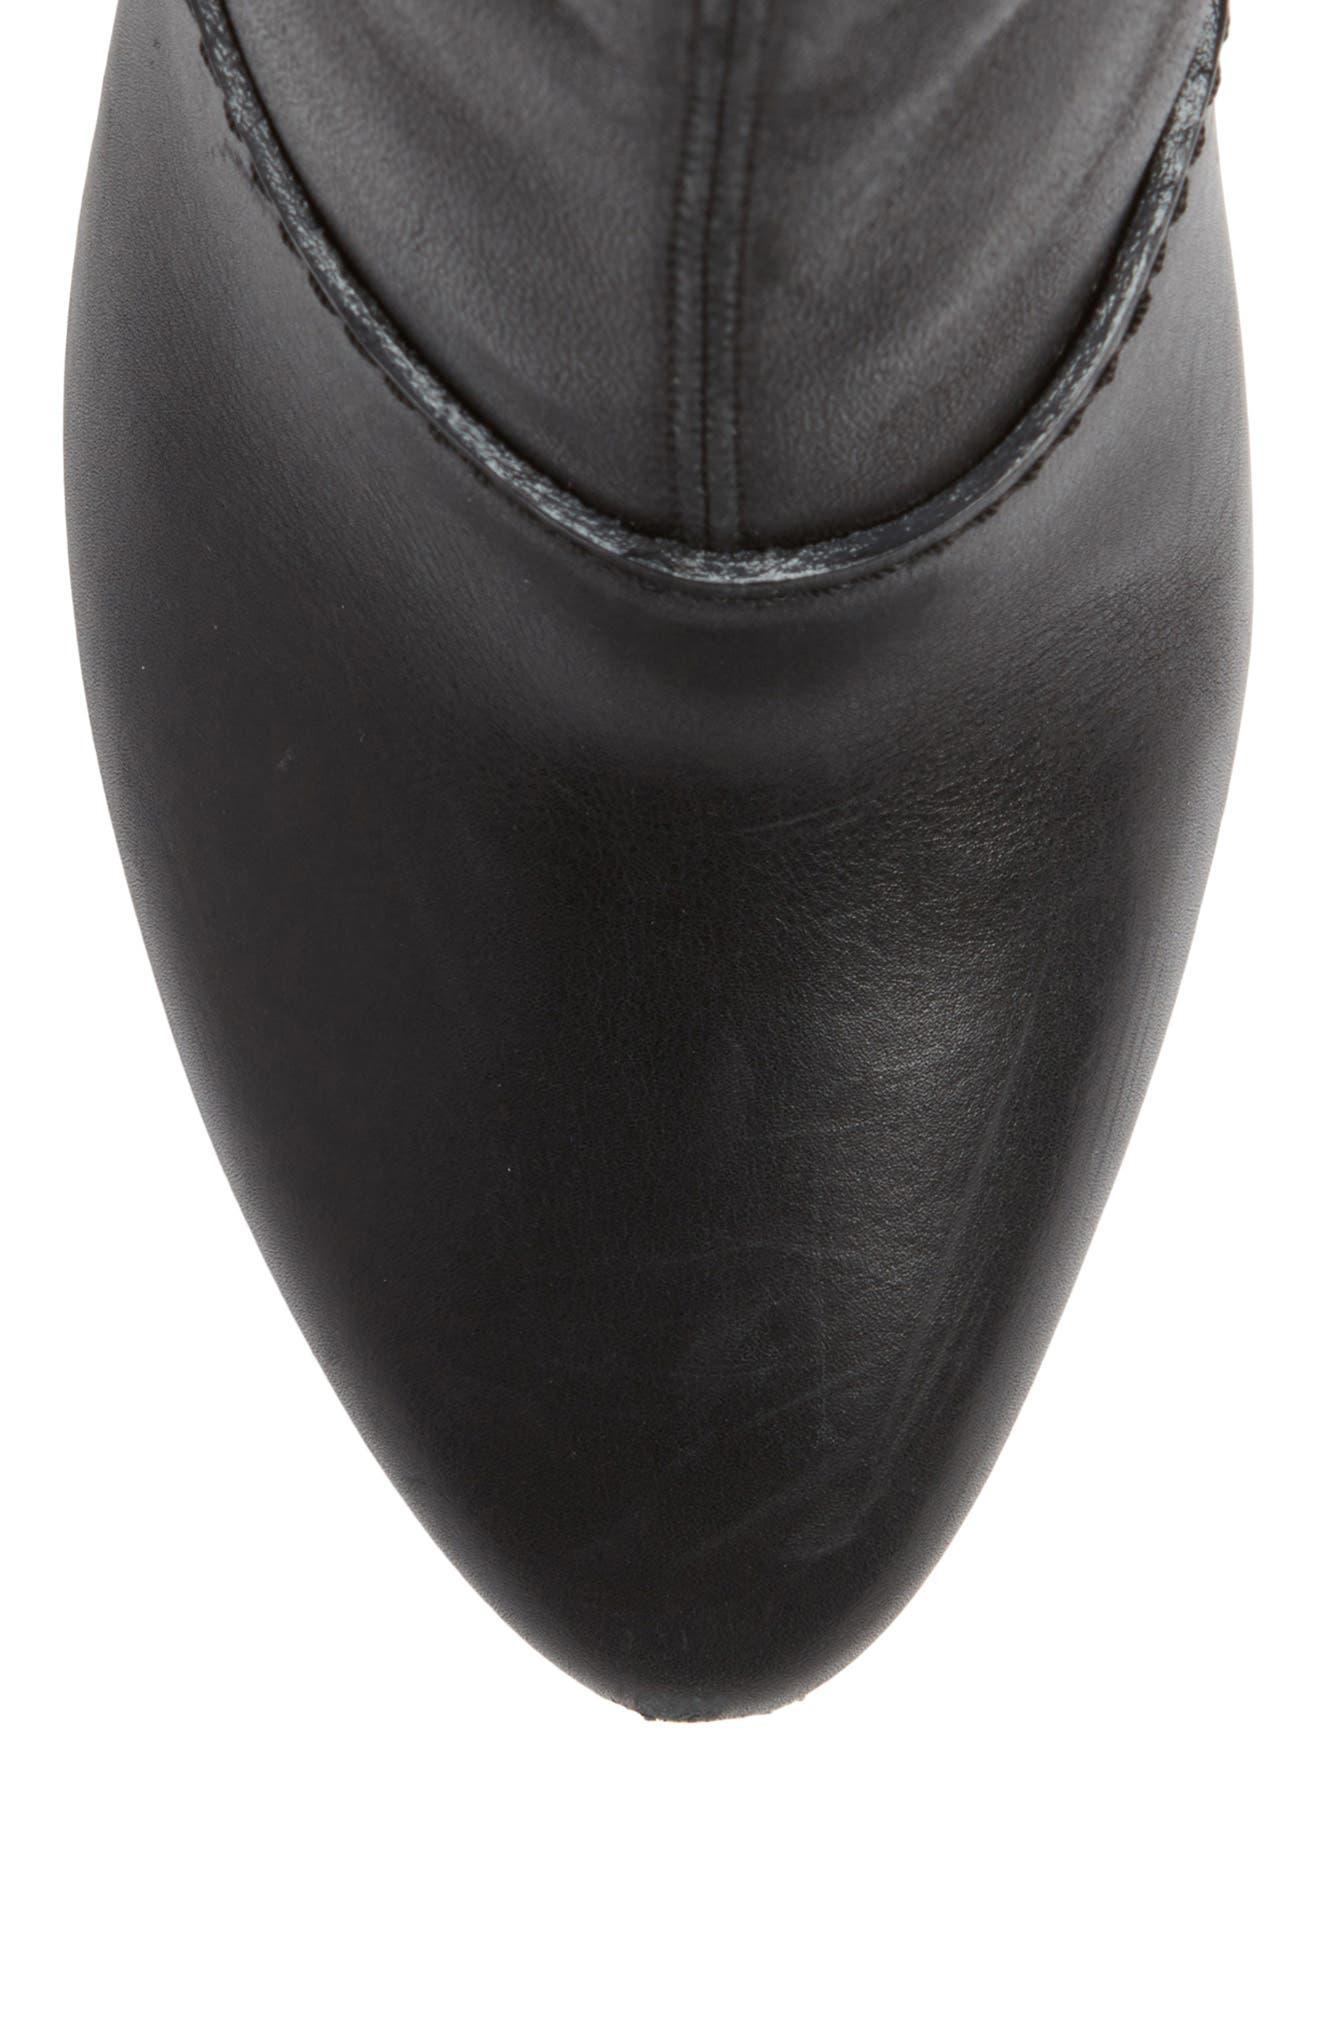 Kyoto Leather Bootie,                             Alternate thumbnail 5, color,                             Black